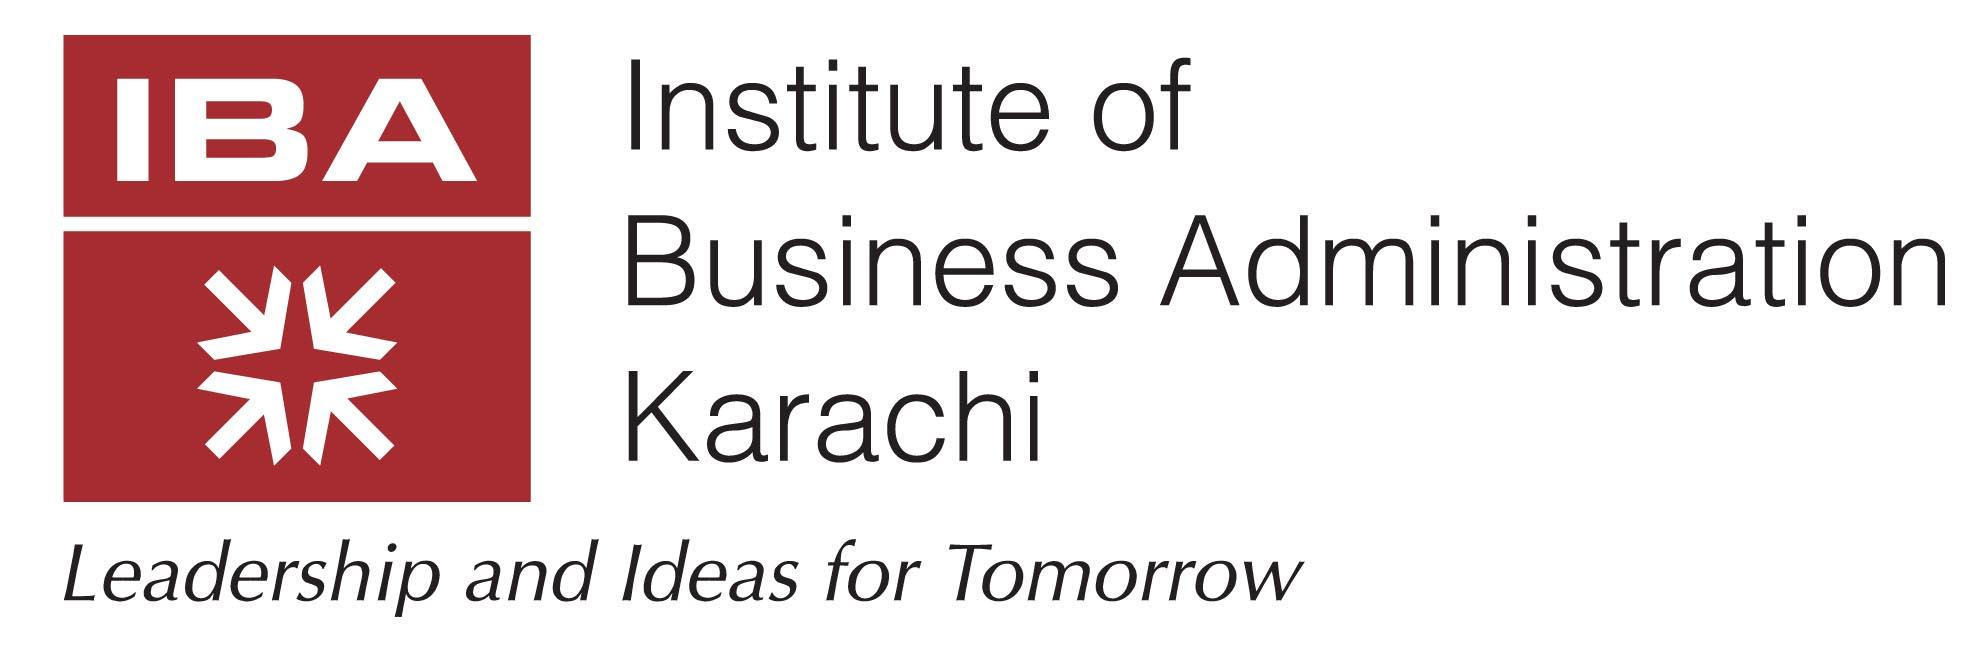 IBA Karachi BBA, MBA Admission 2019 Form, Requirement, Criteria